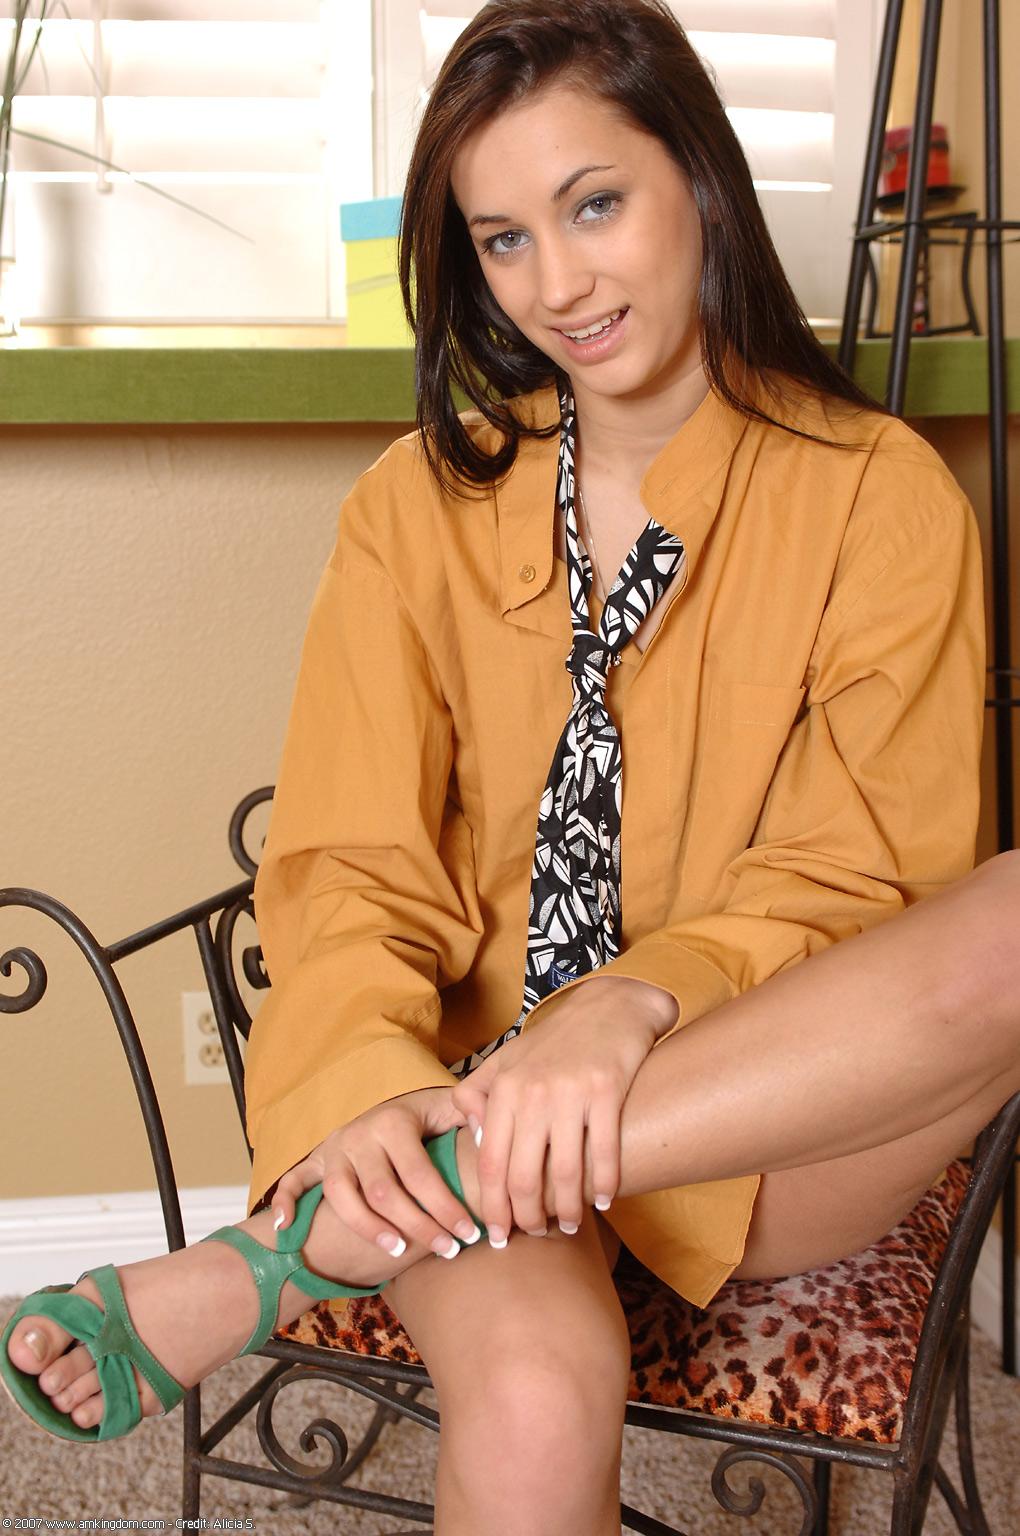 Georgia Jones Feet Porn Georgia Jones Feet Showing Porn Images For Georgia Jones